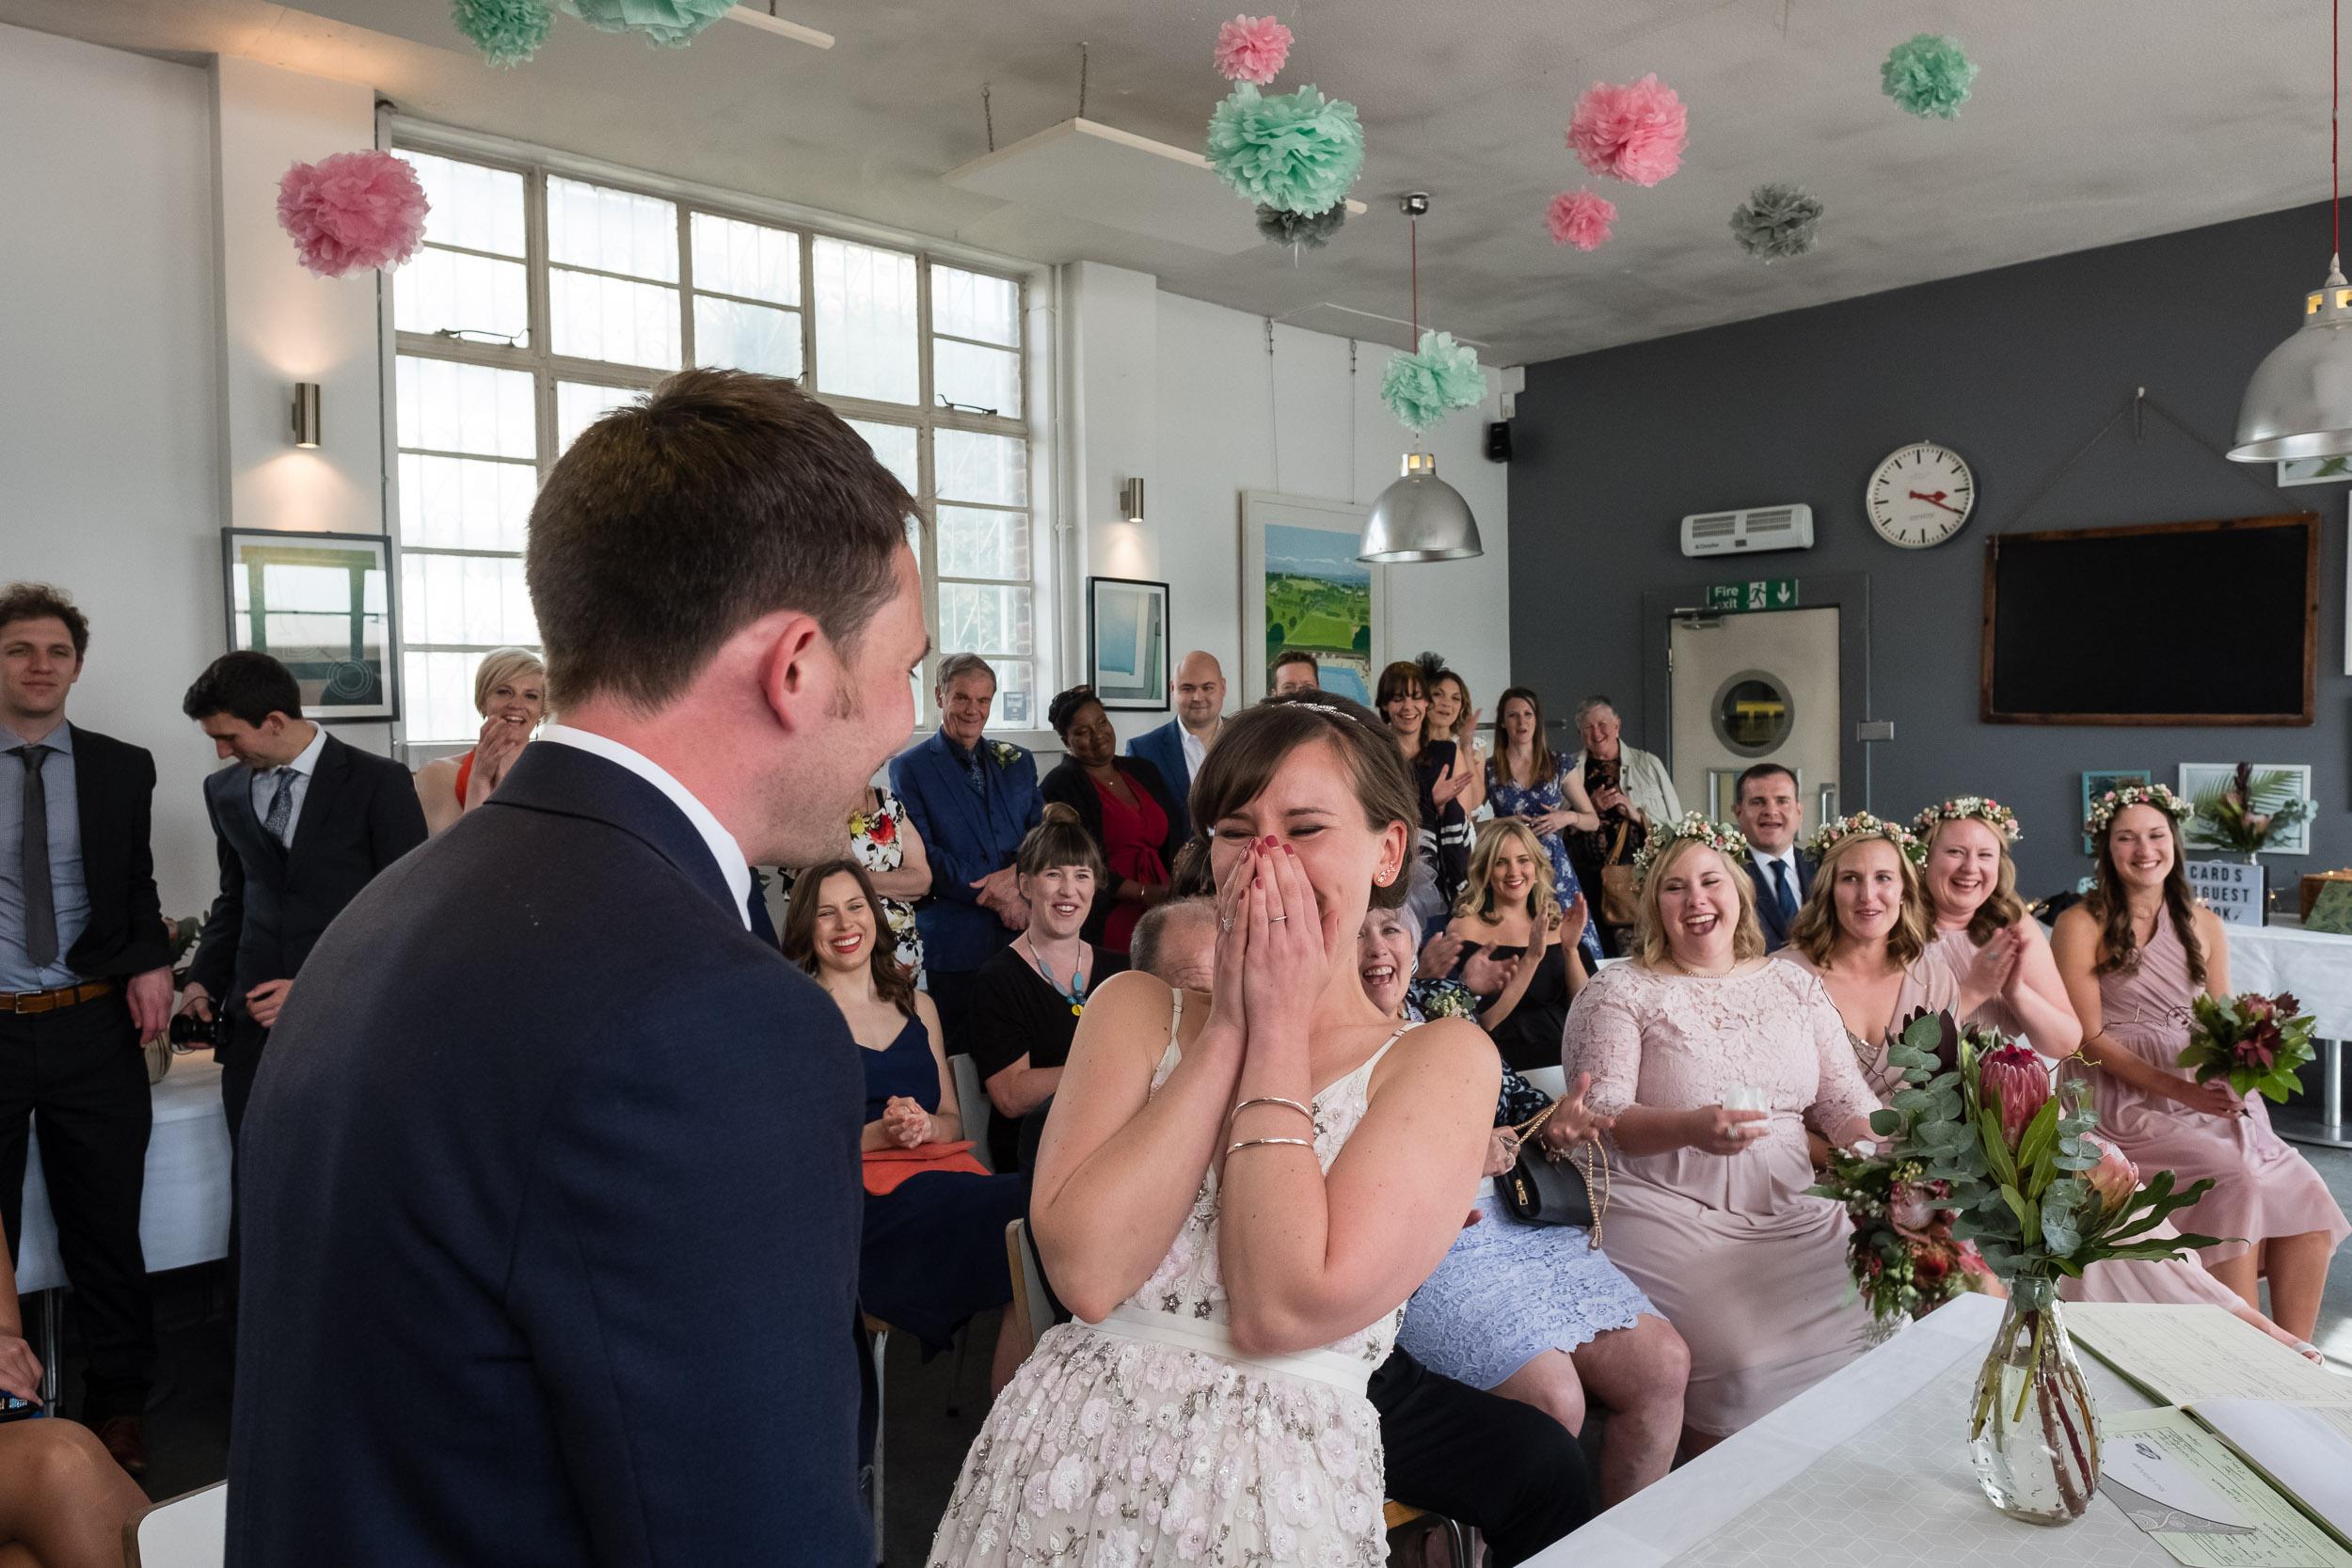 brockwell-lido-brixton-herne-hill-wedding-180.jpg